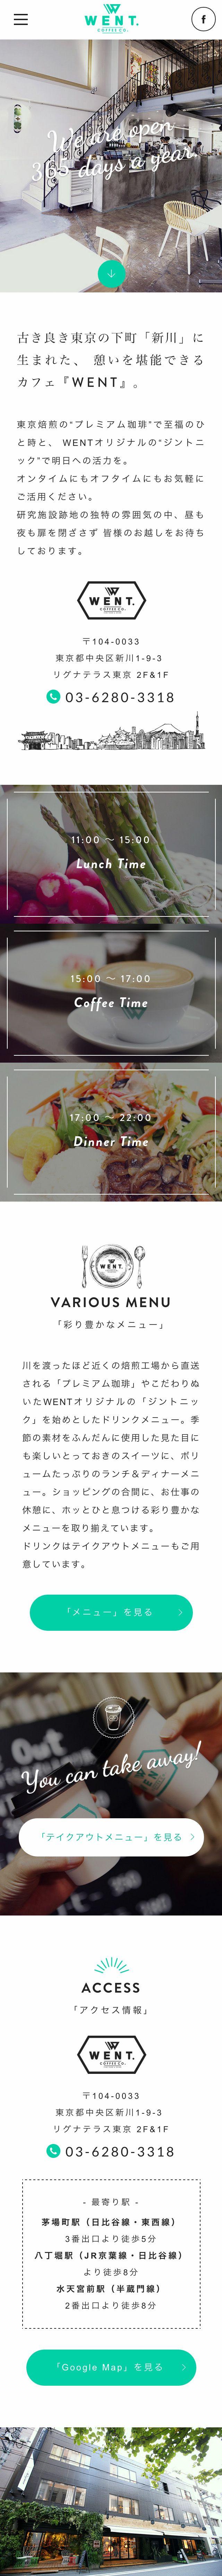 http://went.tokyo/